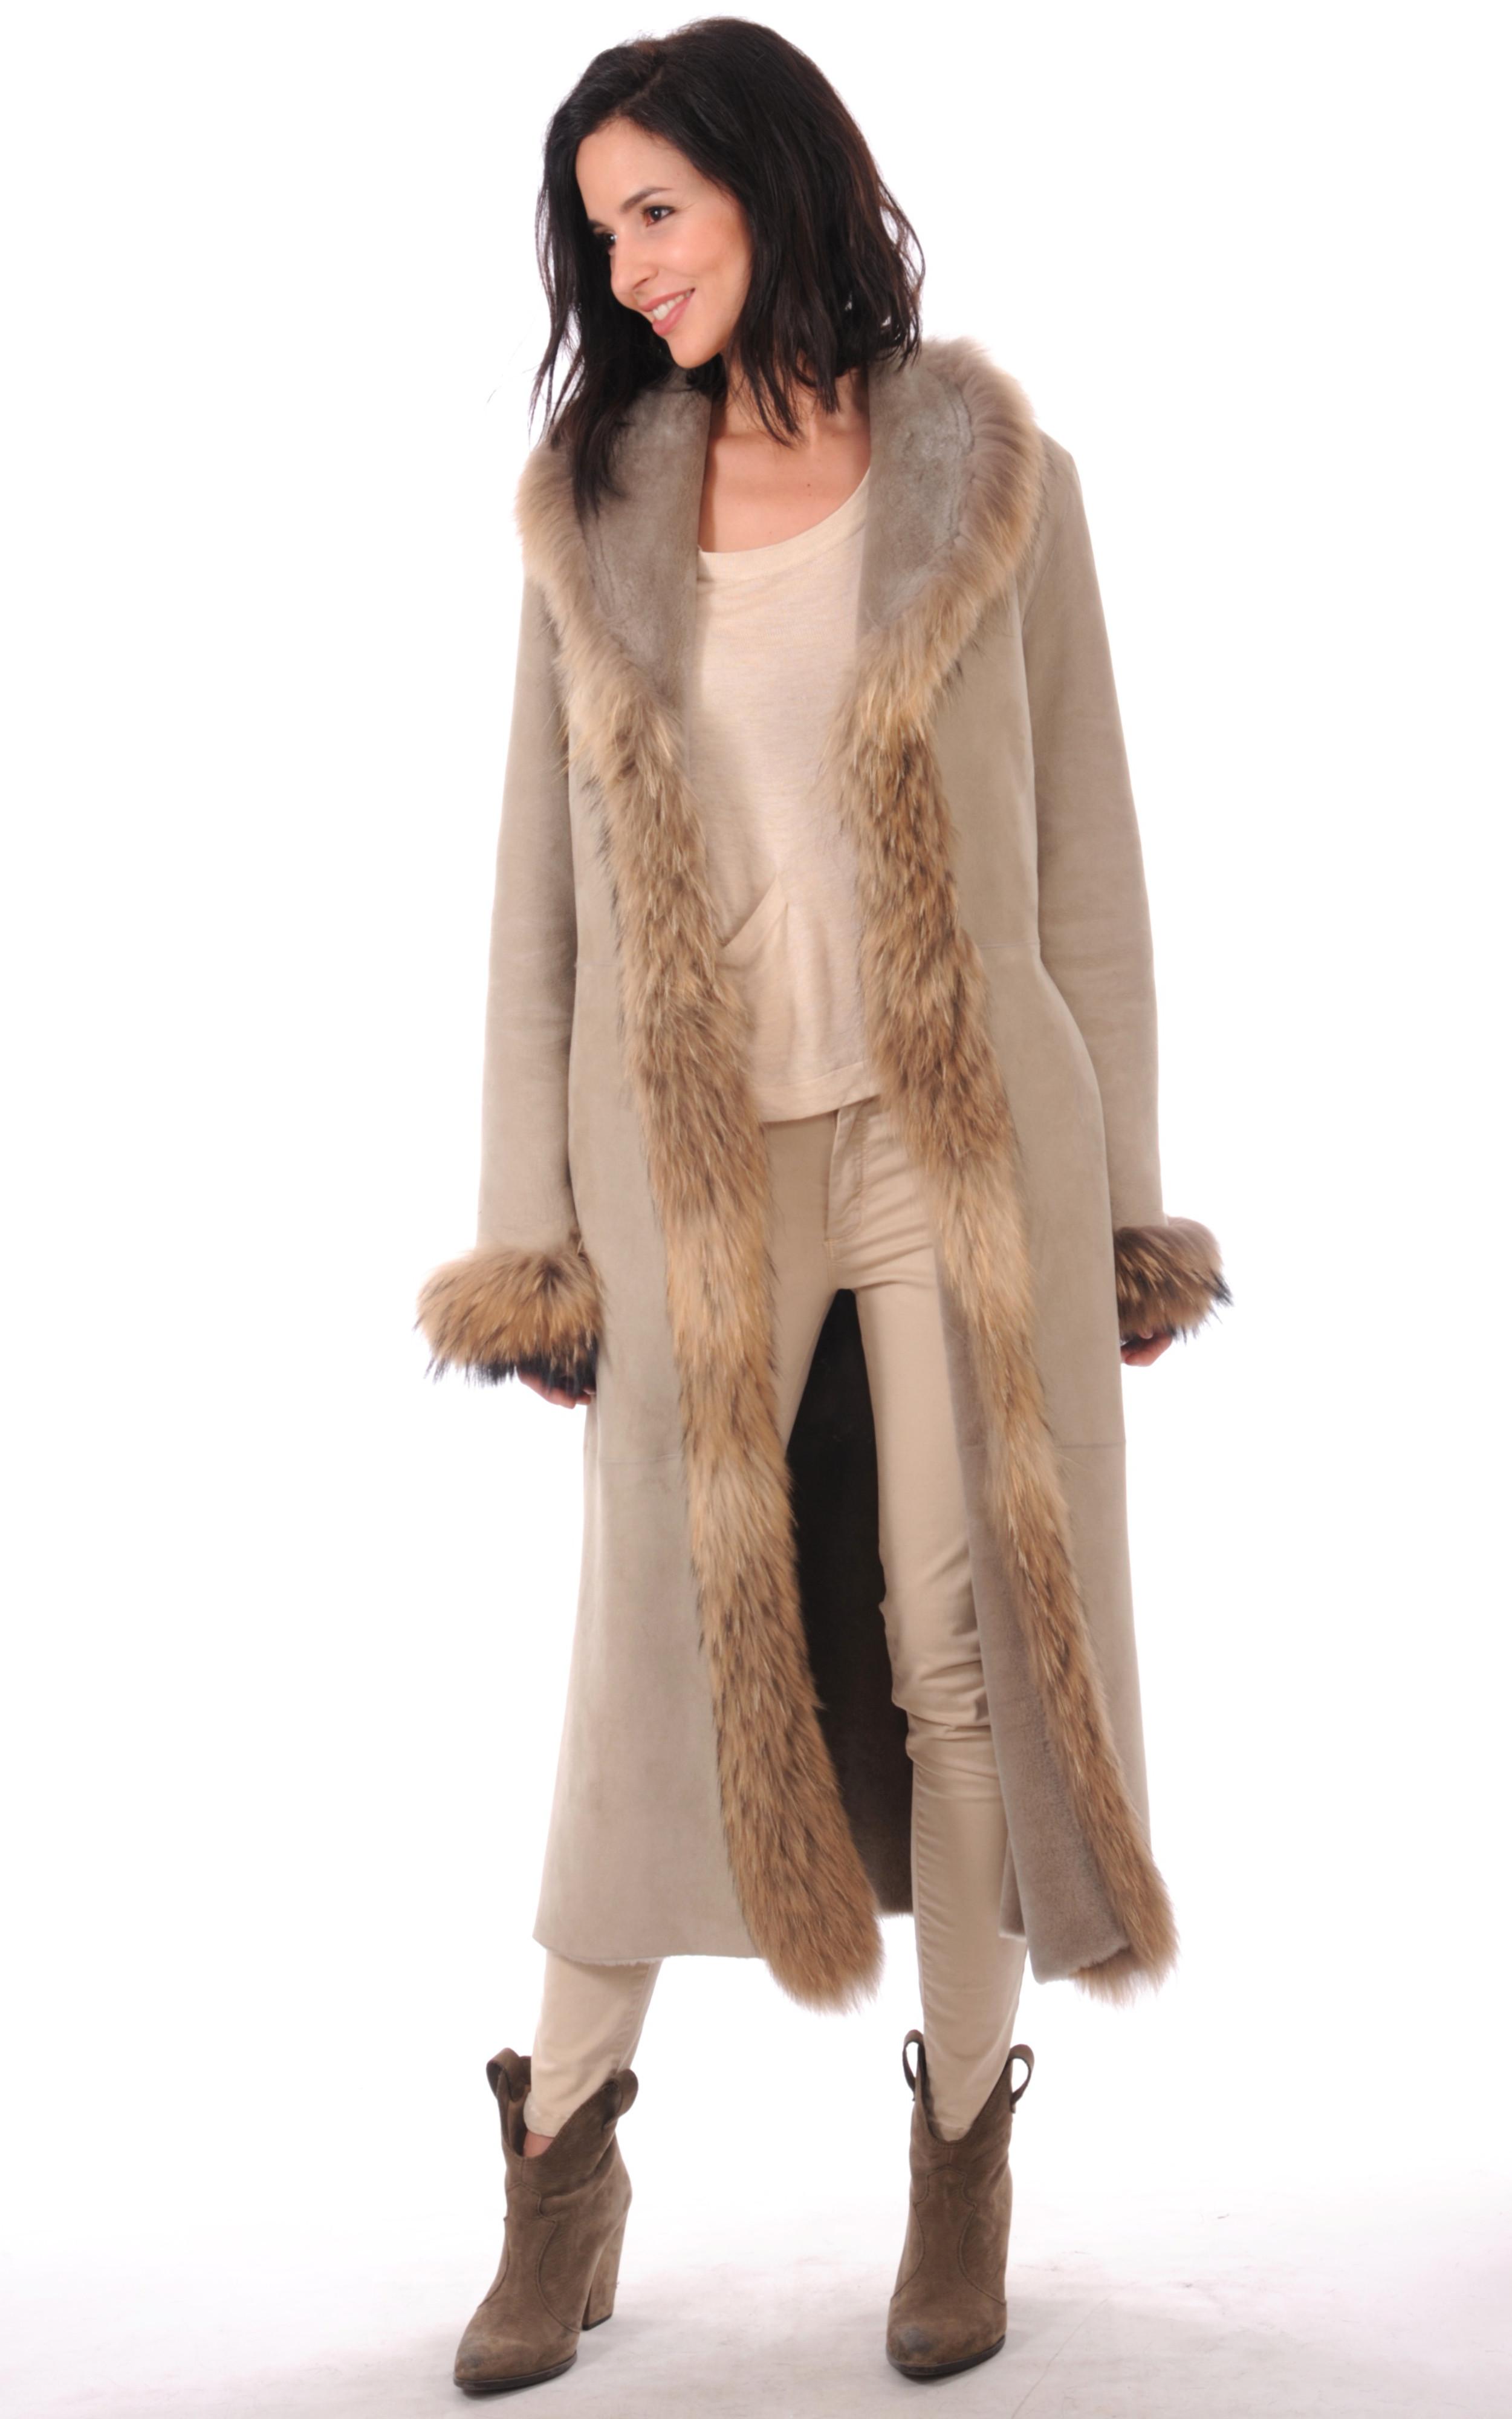 manteau long bord fourrure femme la canadienne la canadienne manteau 7 8 peau lain e beige. Black Bedroom Furniture Sets. Home Design Ideas